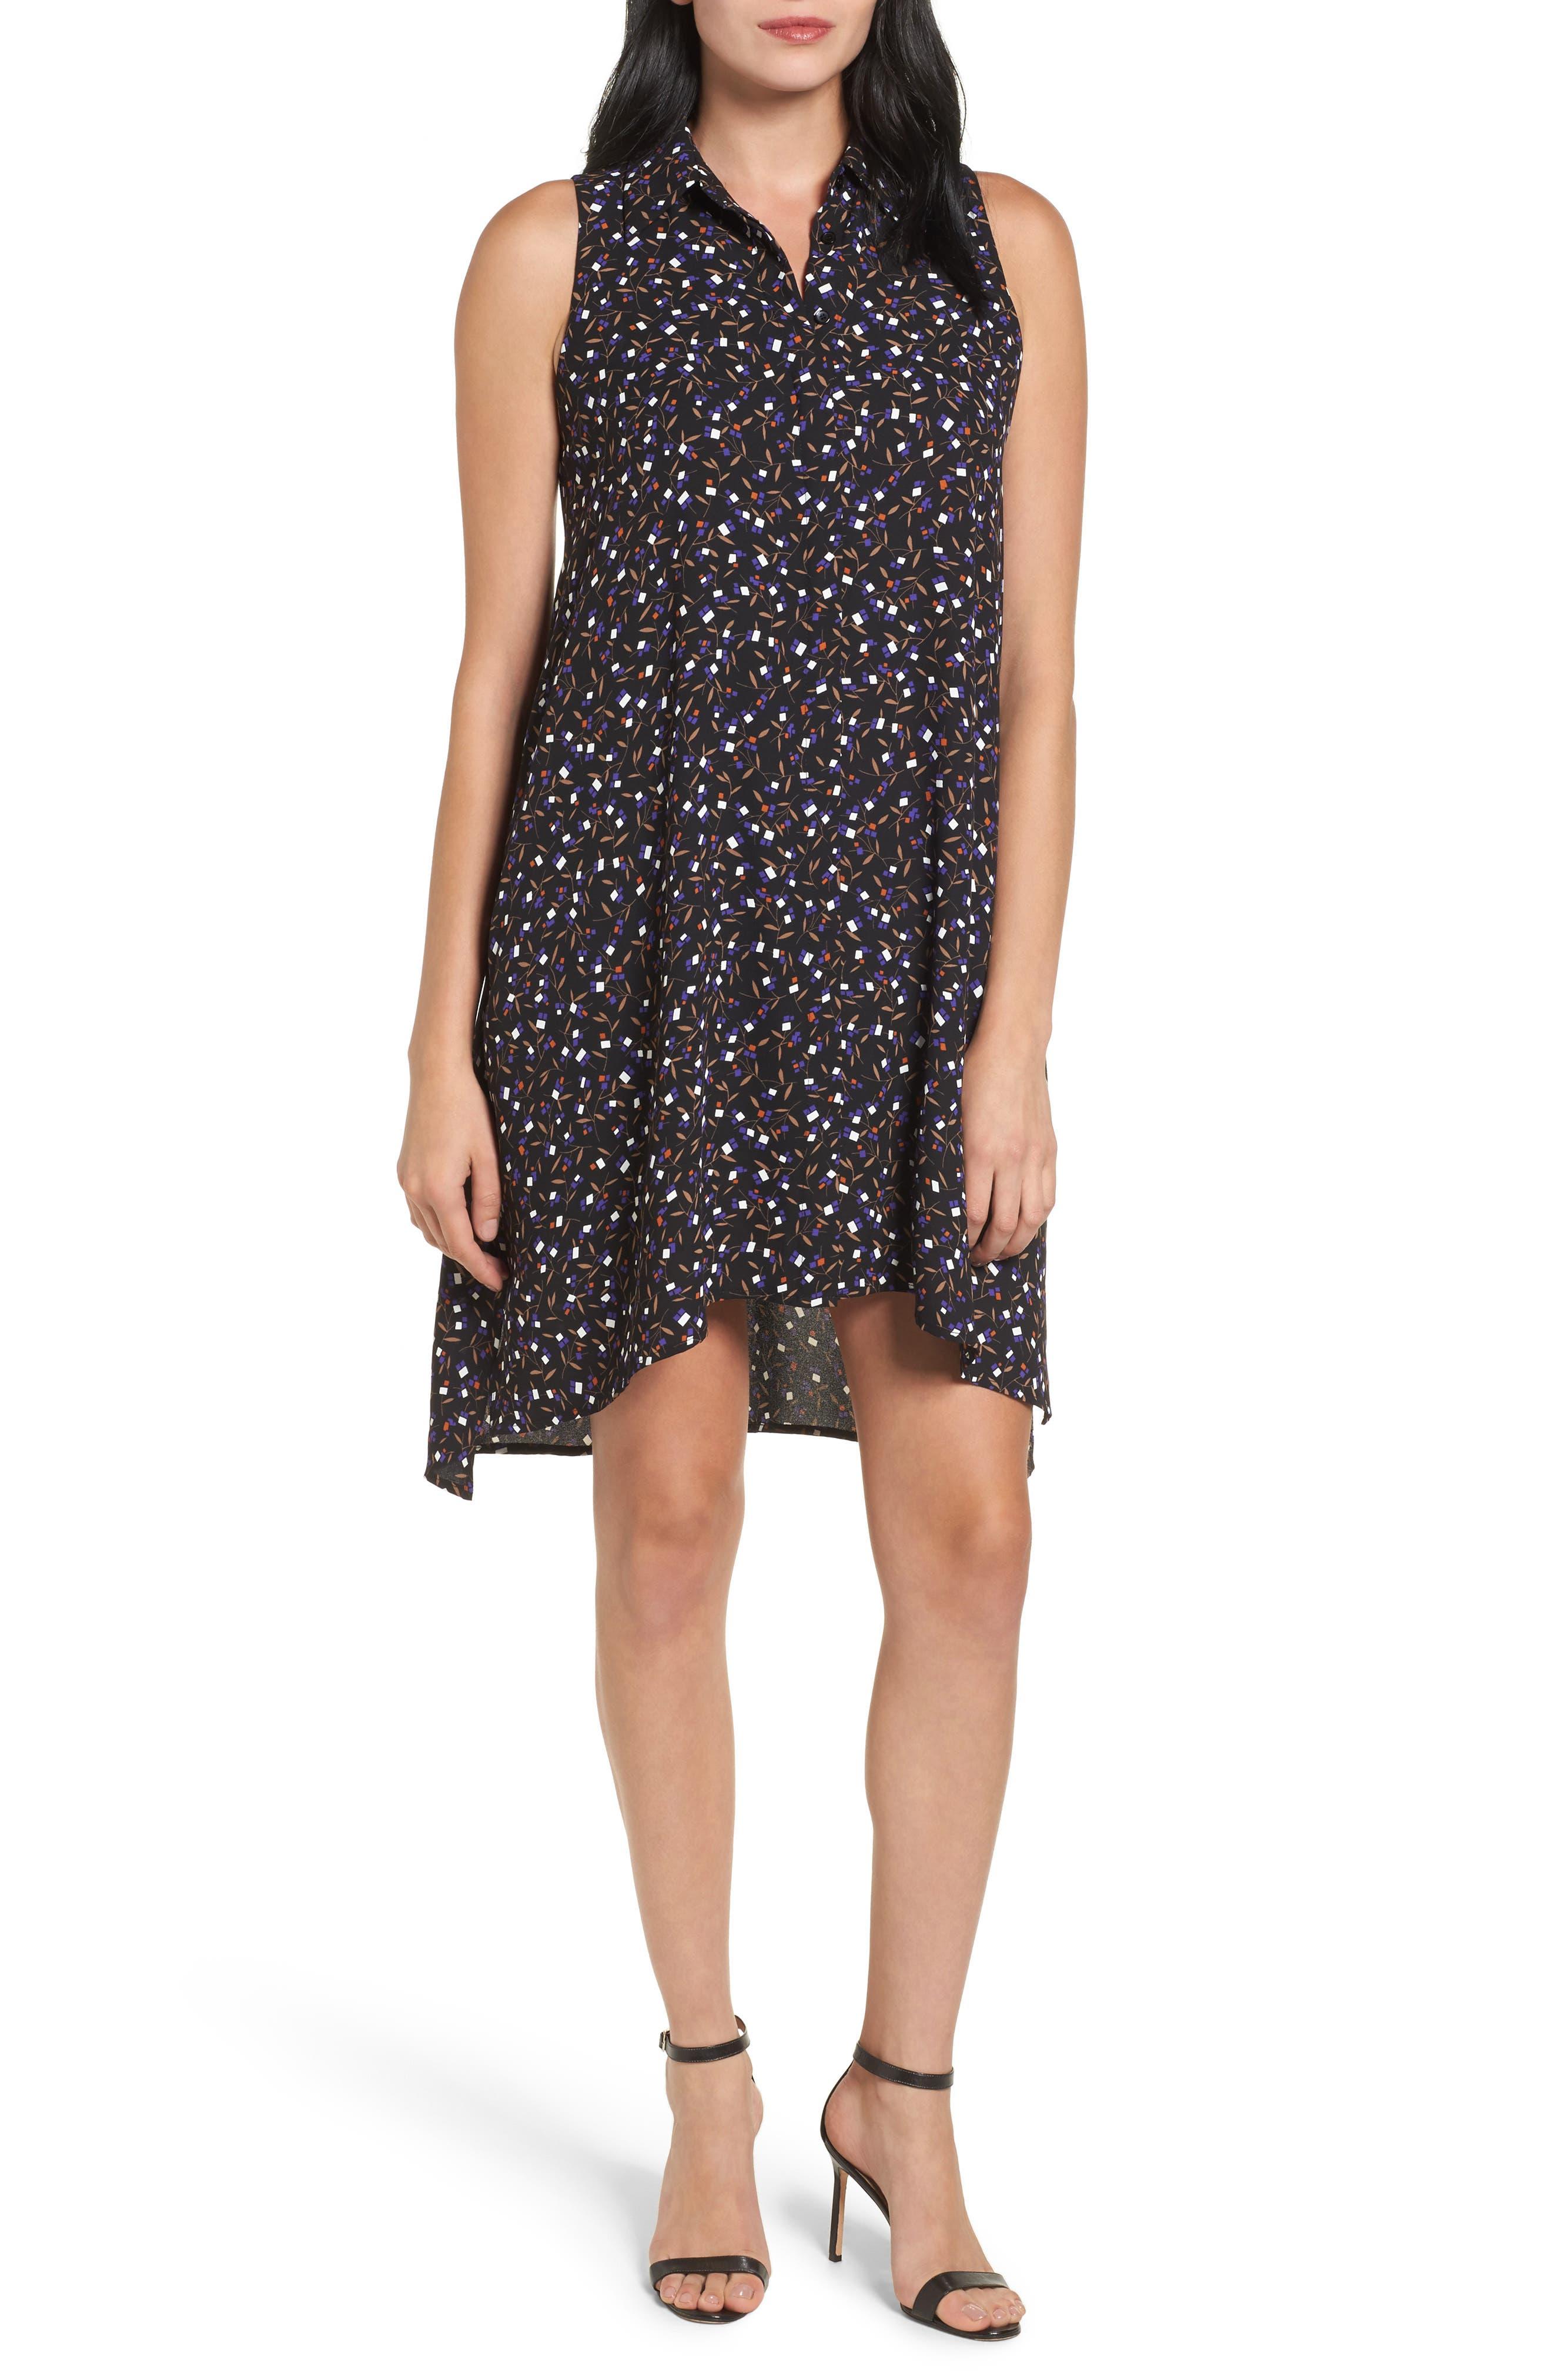 Polo Dress,                             Main thumbnail 1, color,                             Black/ Mushroom Combo